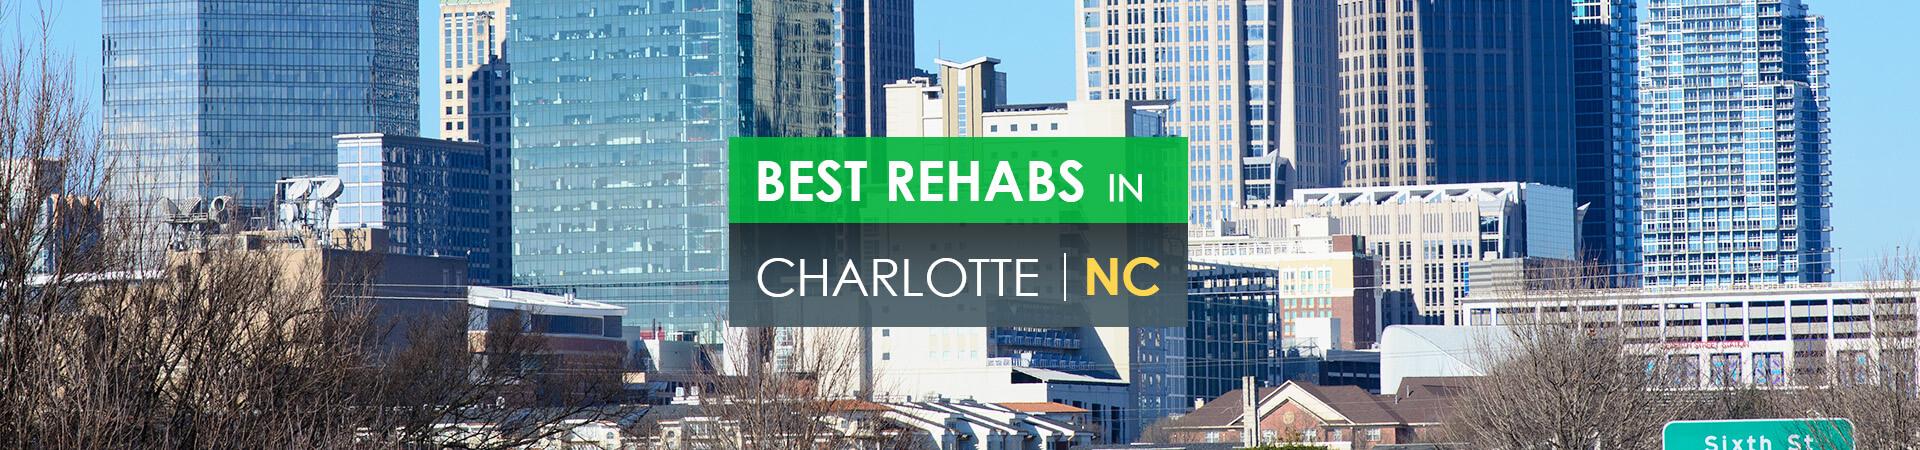 Best rehabs in Charlotte, NC